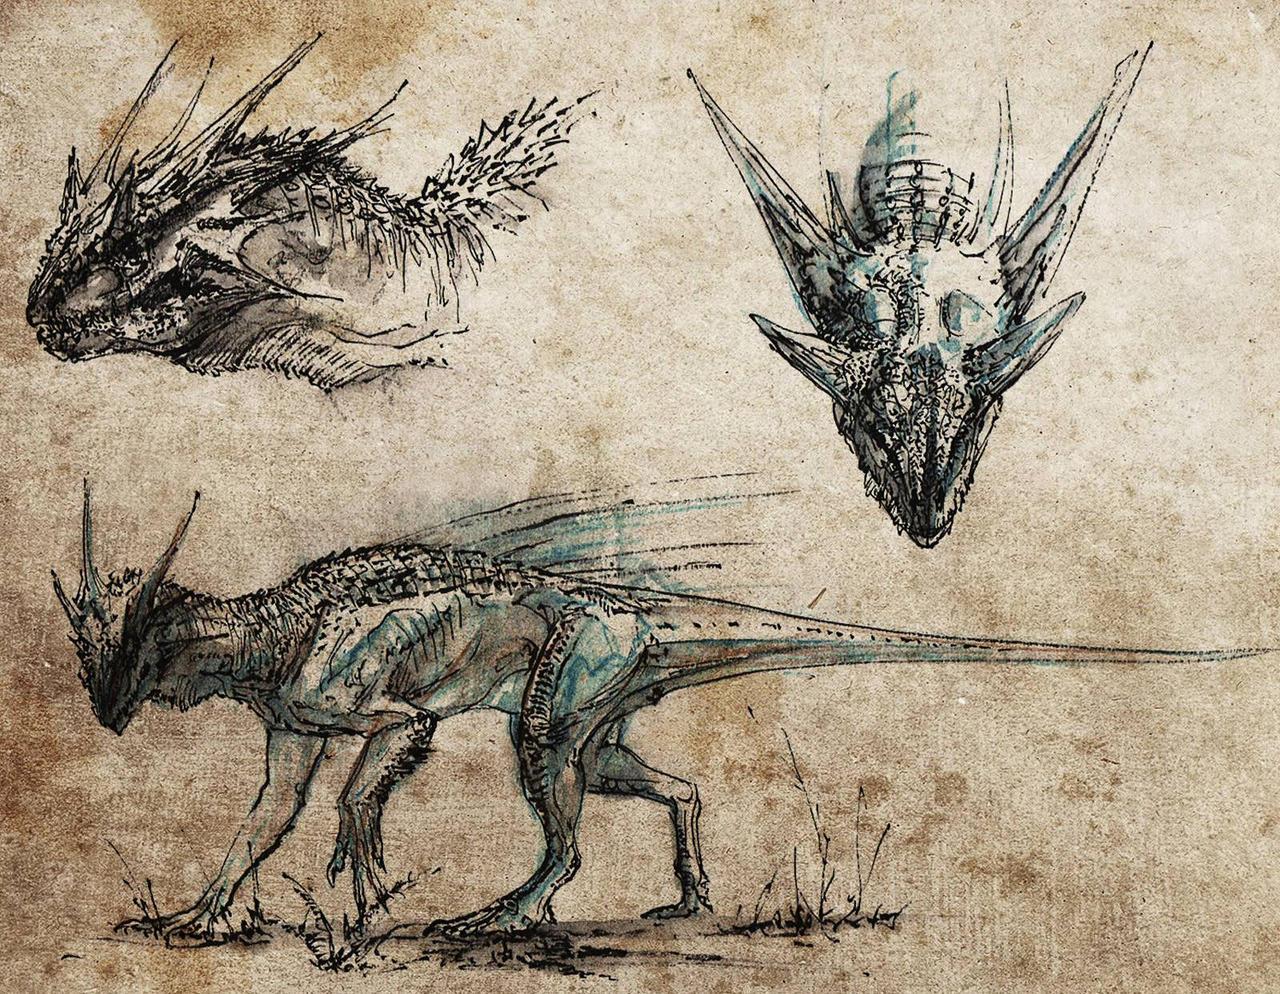 tat-dragon-11 by cheungchungtat